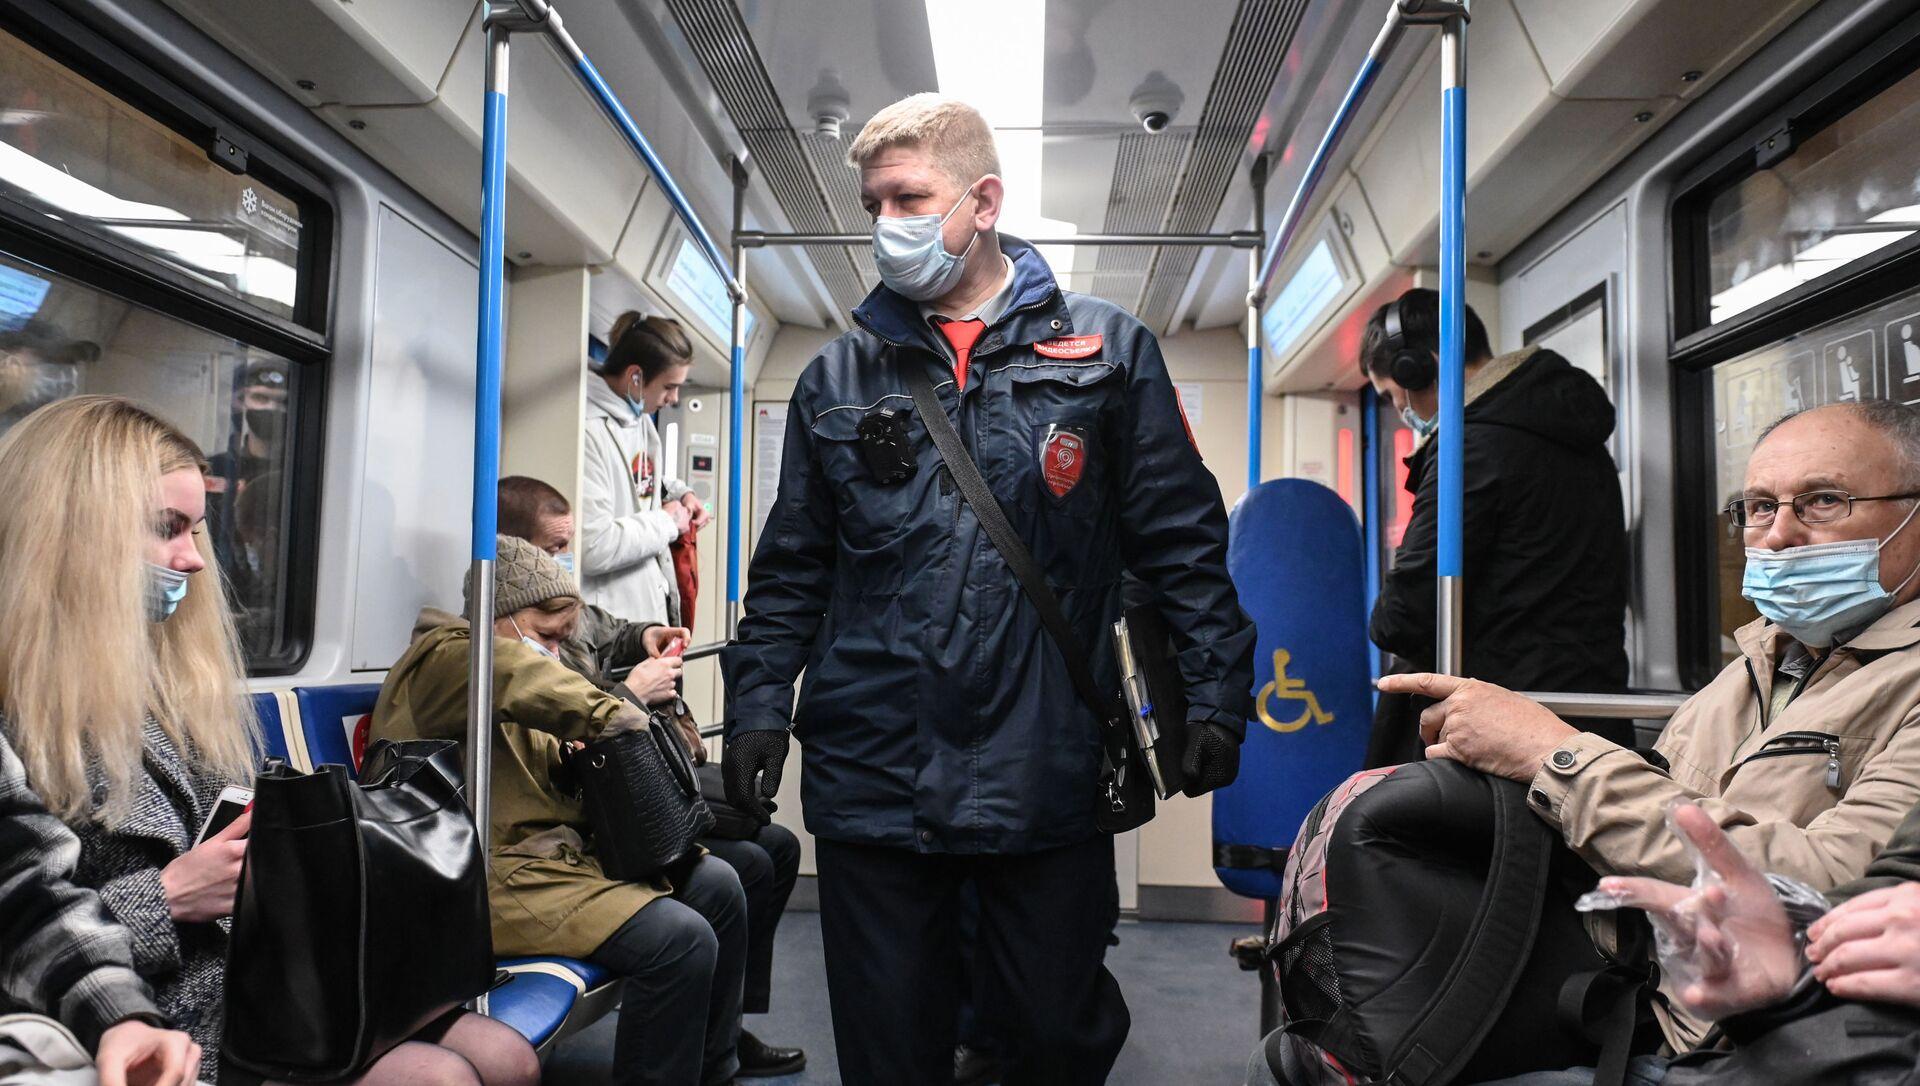 Rusya-koronavirüs-maske - Sputnik Türkiye, 1920, 21.05.2021